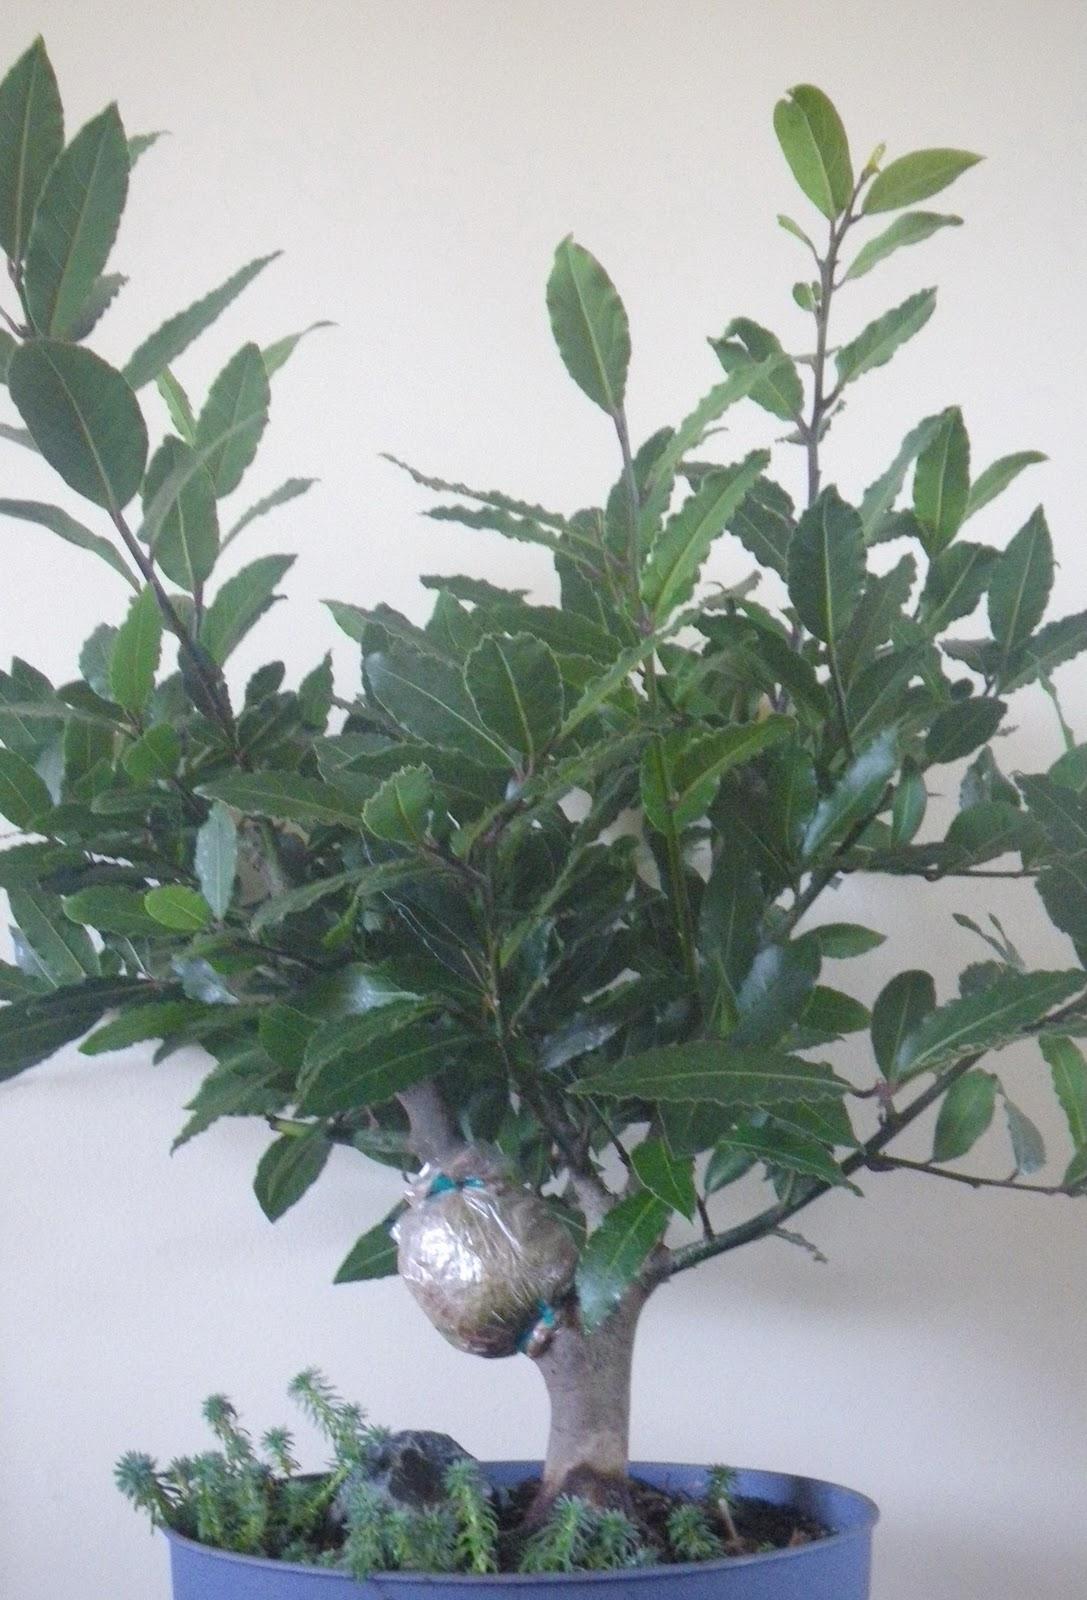 Scented Leaf Bay Laurel Edible And Medicinal Tree